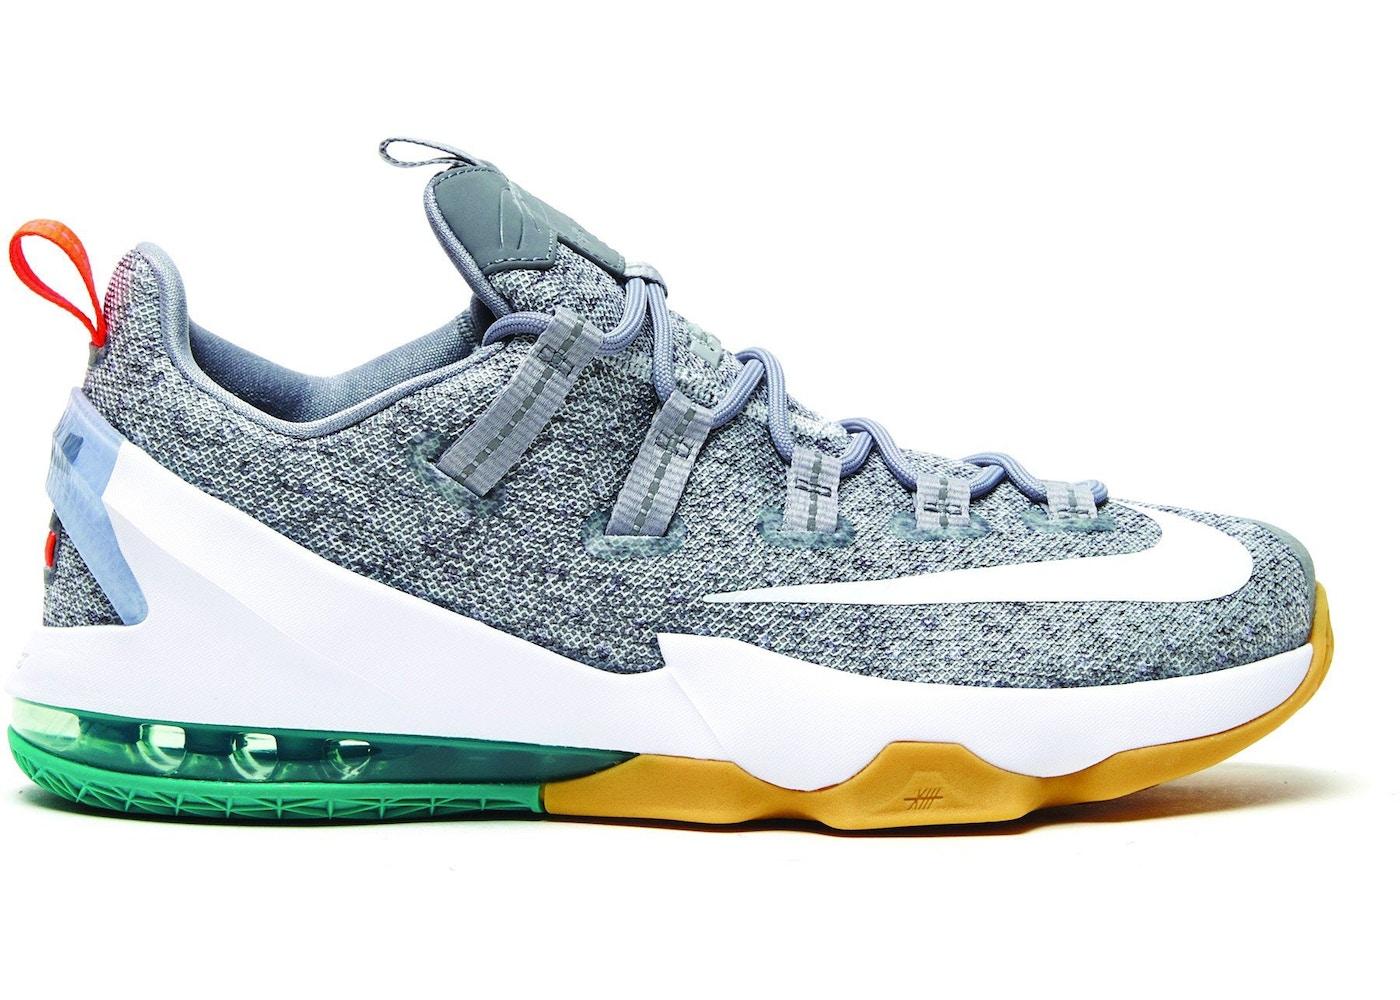 Nike LeBron 13 Shoes - Average Sale Price